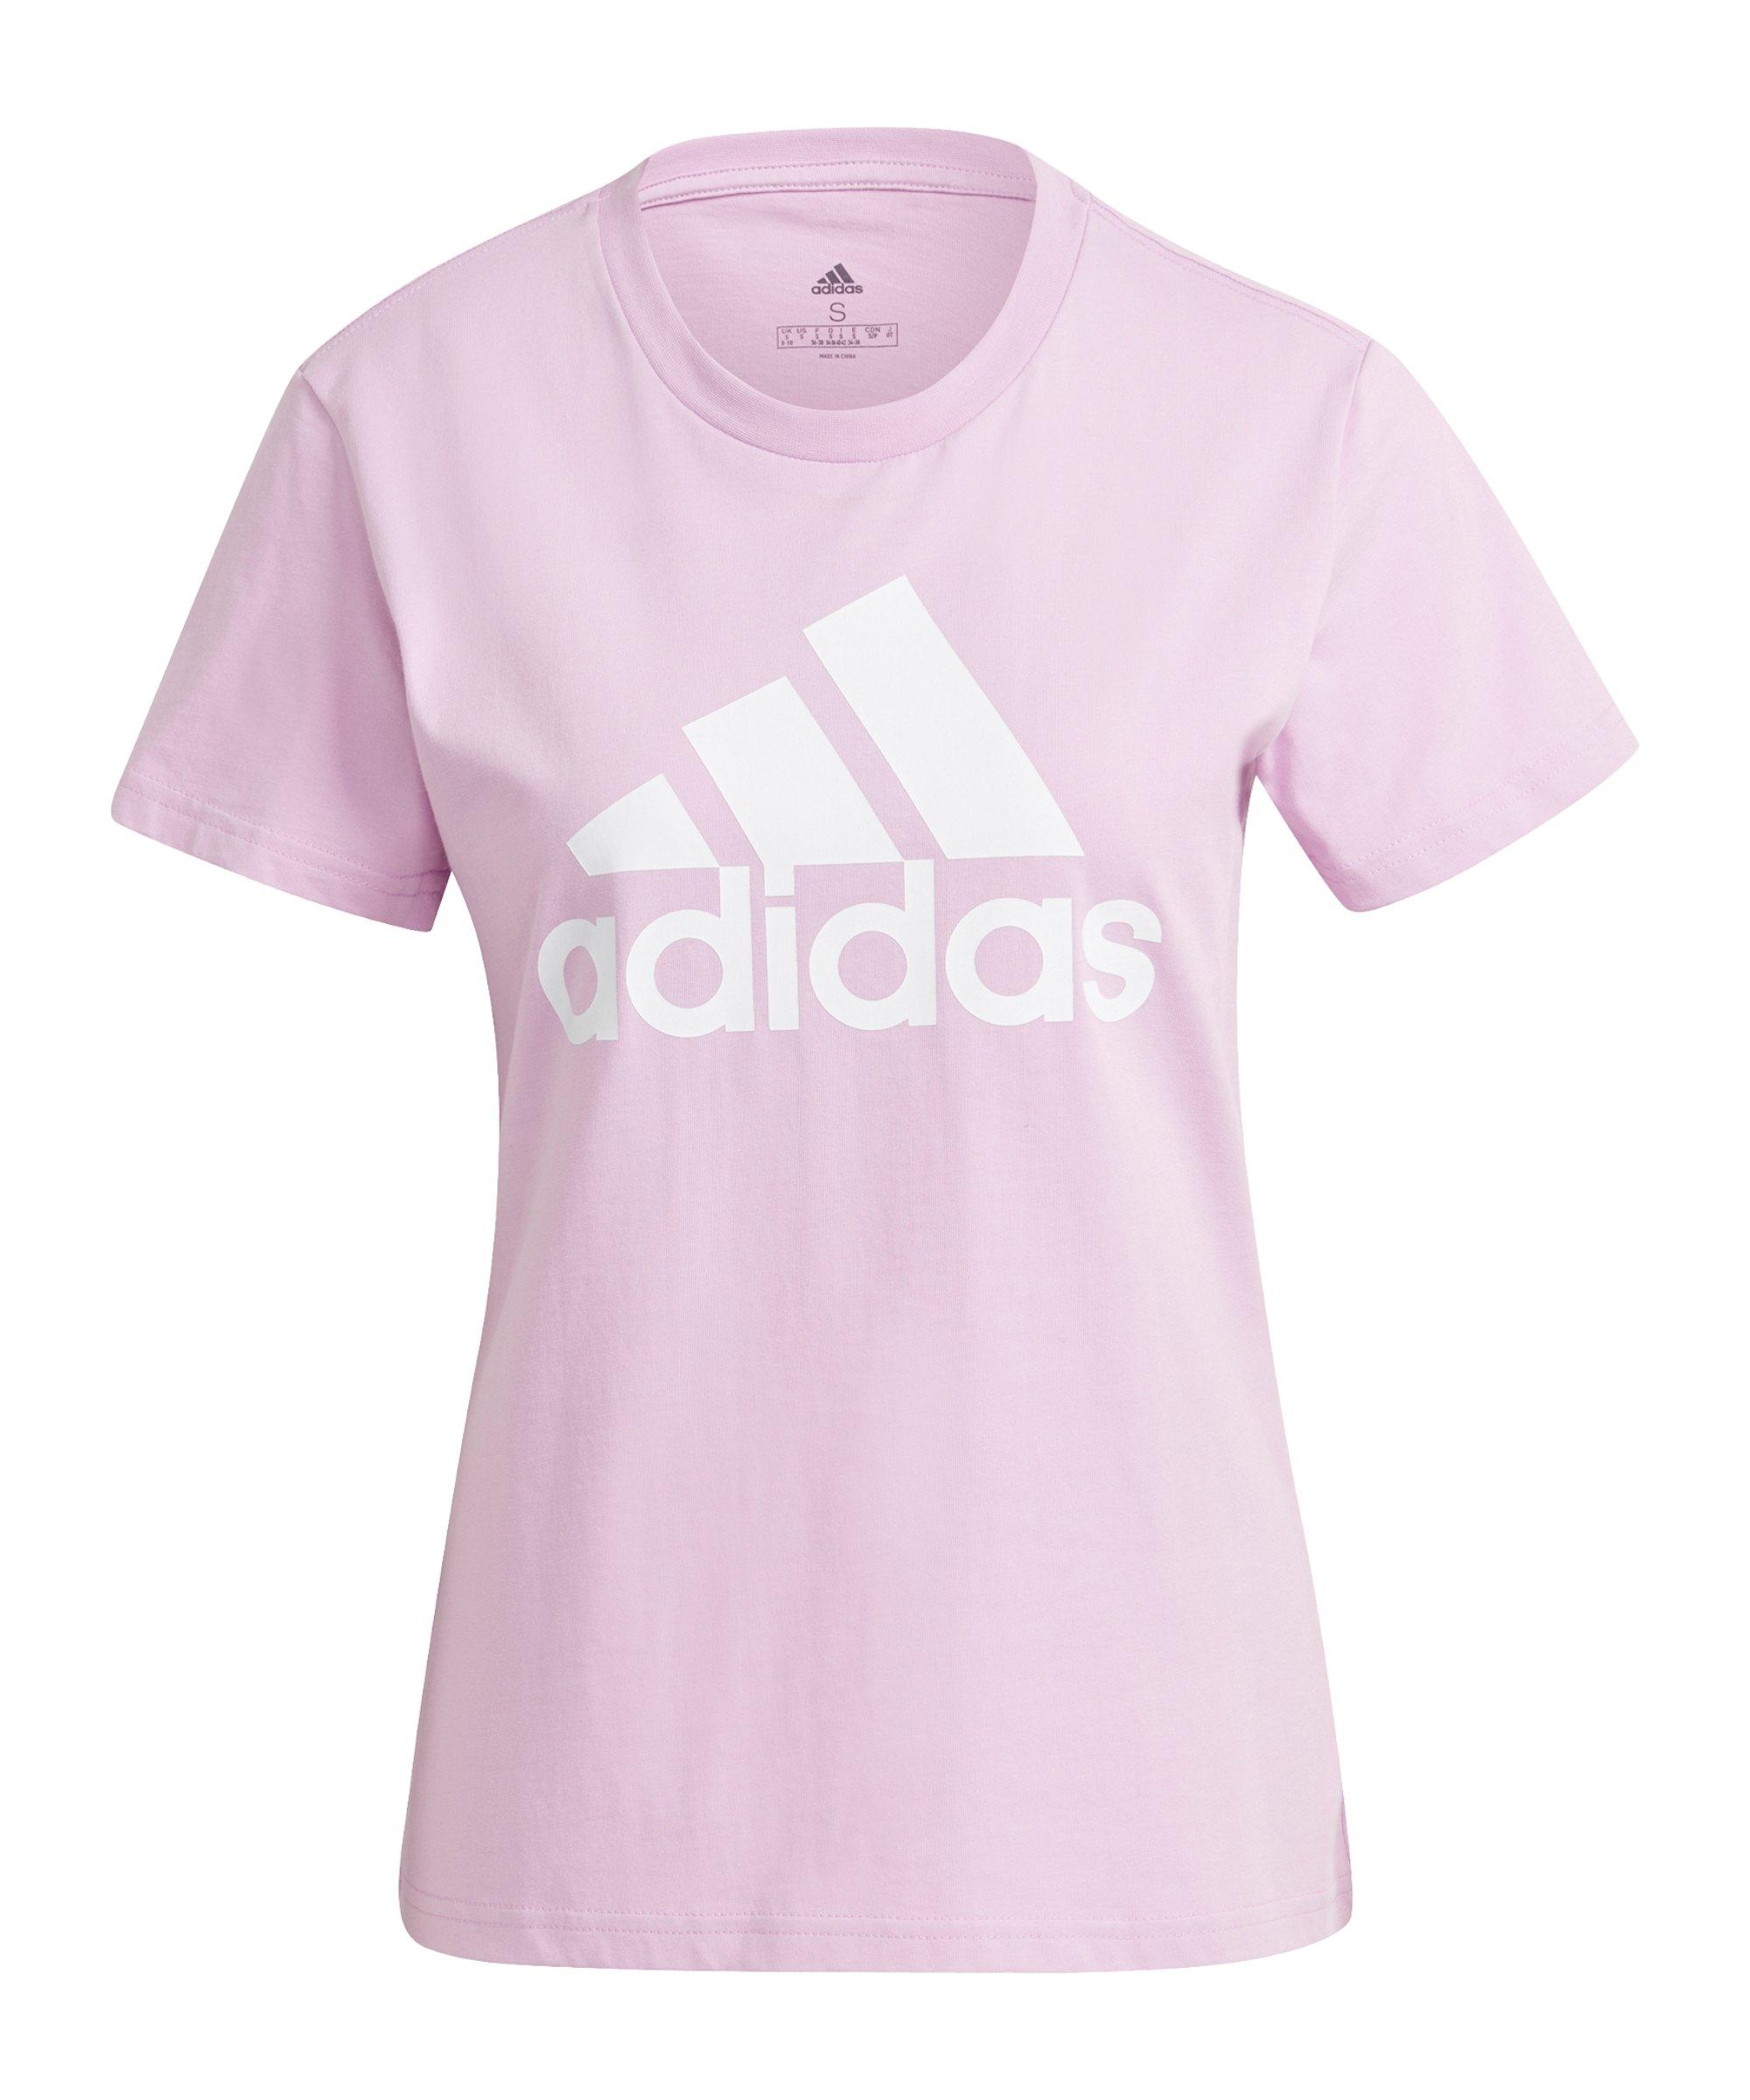 adidas Essentials Regular T-Shirt Damen Lila - lila